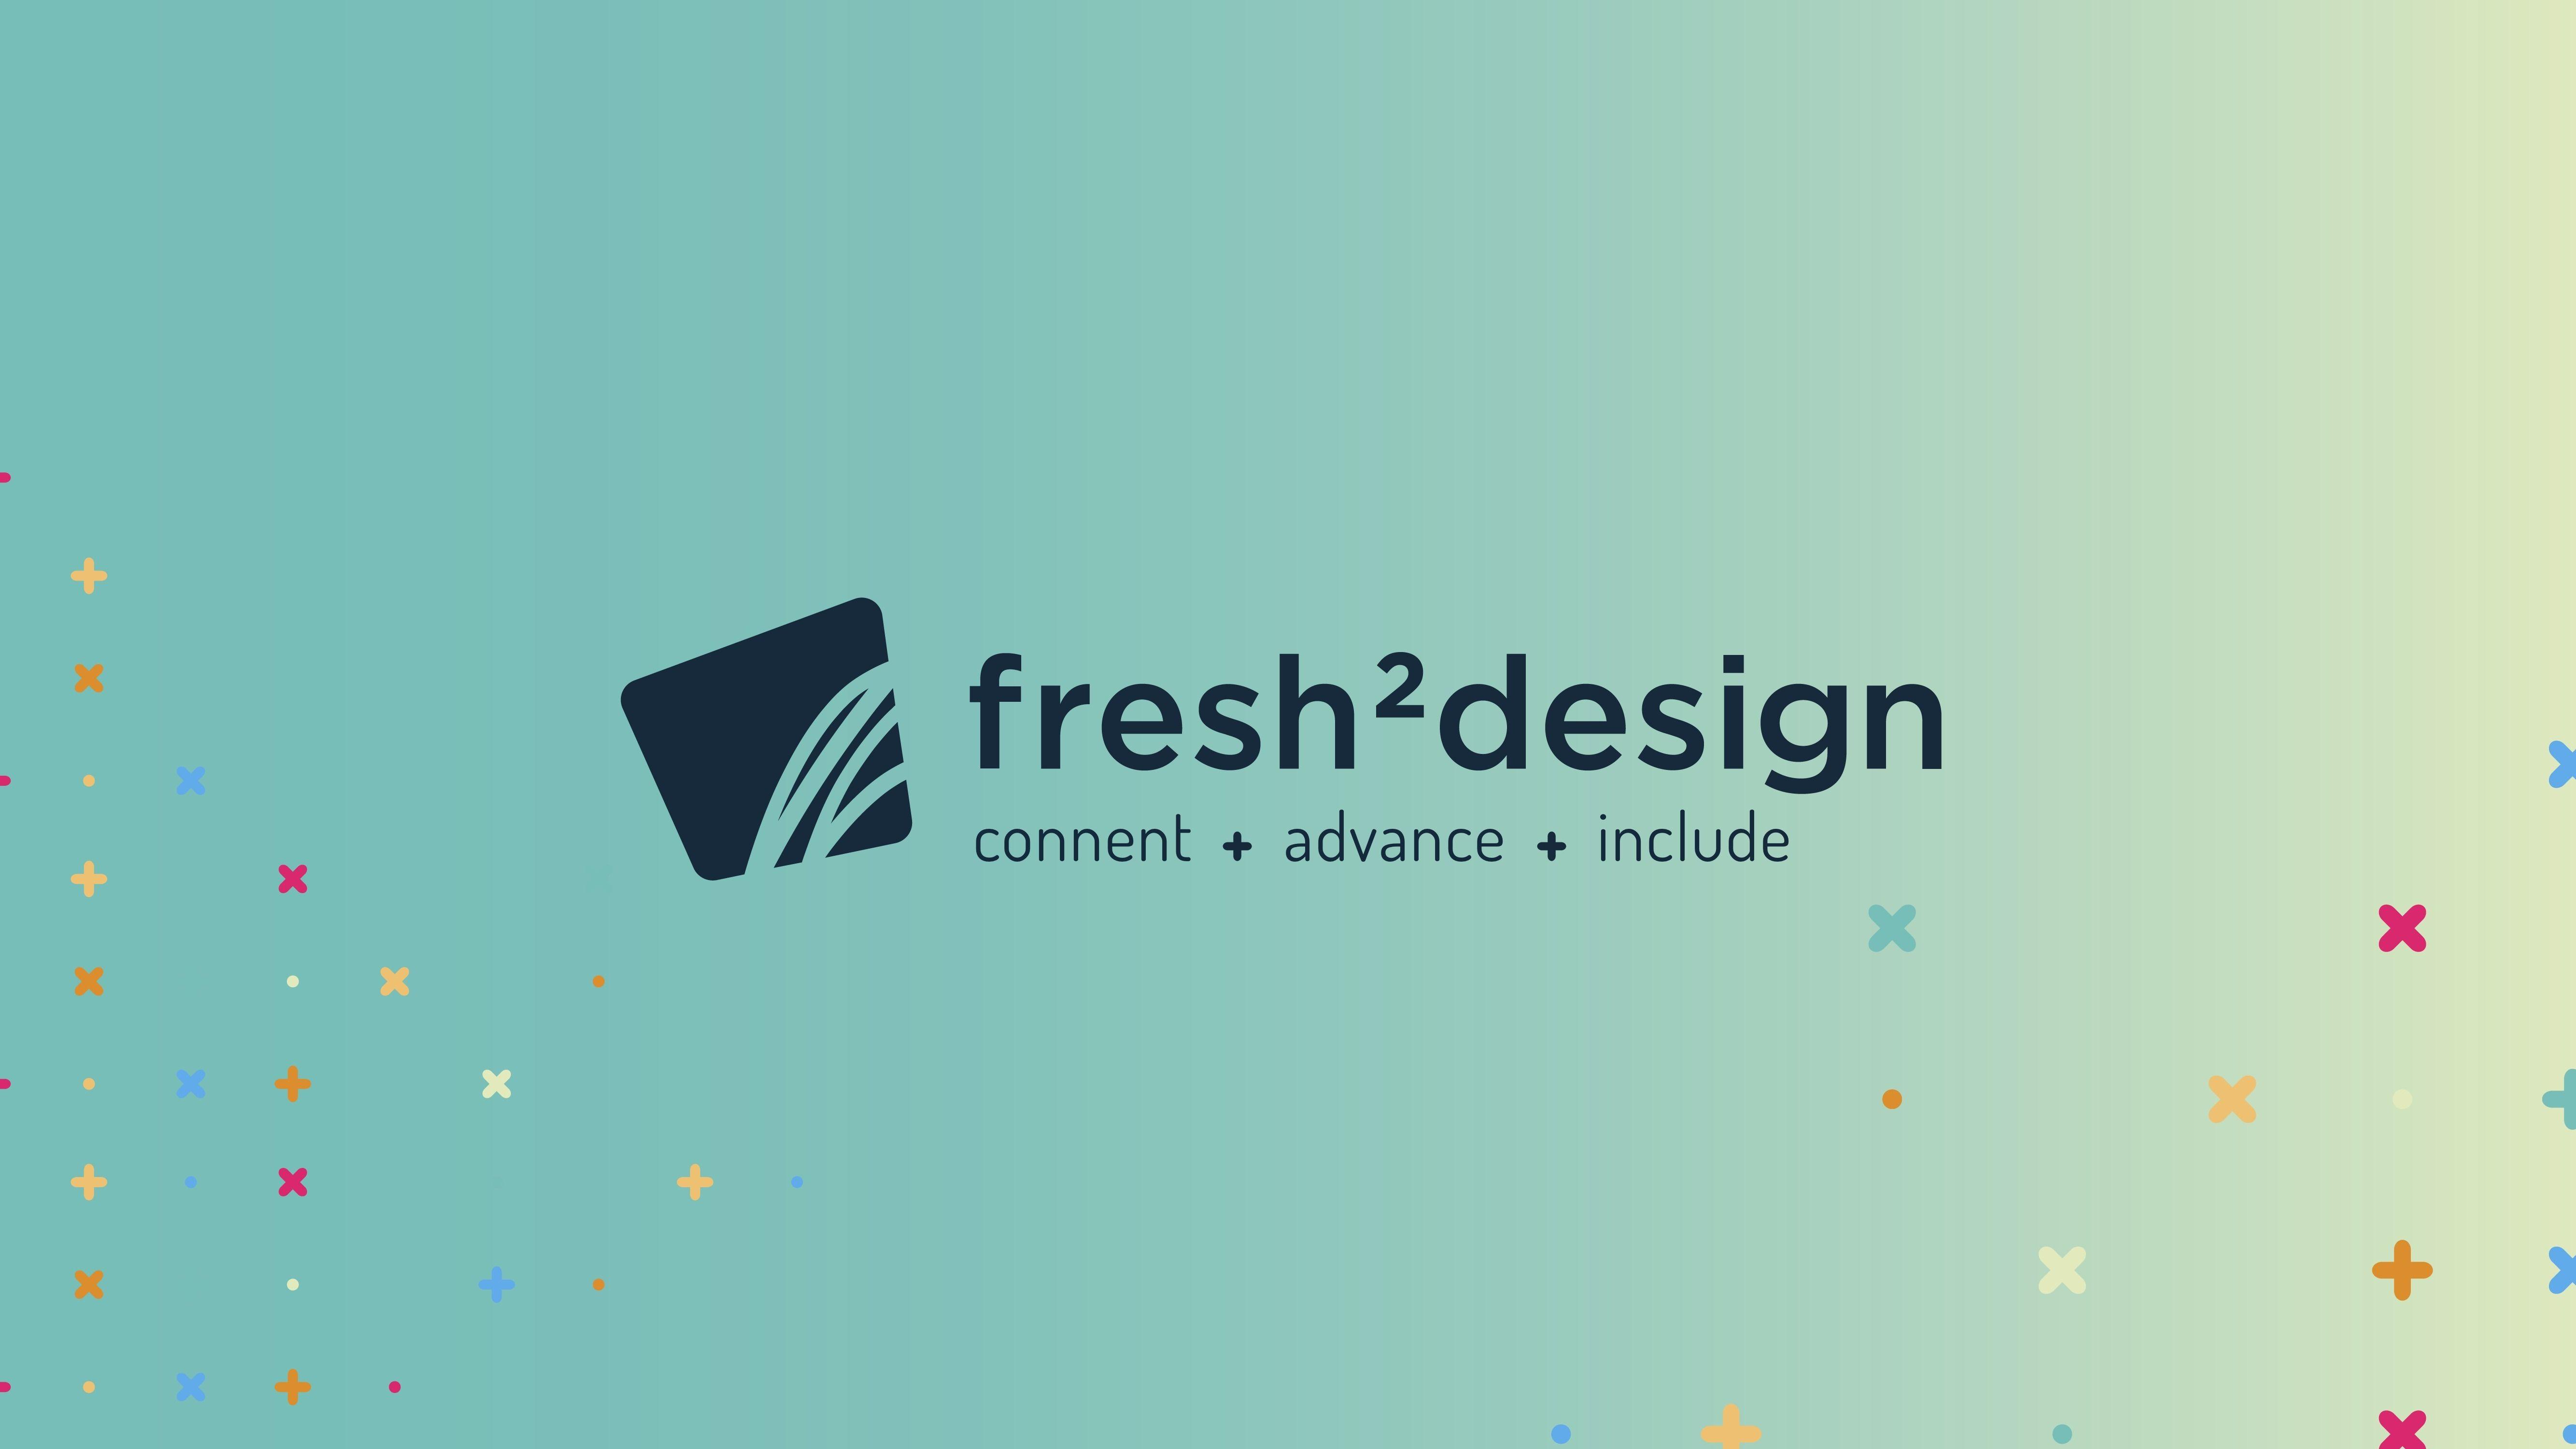 fresh2design